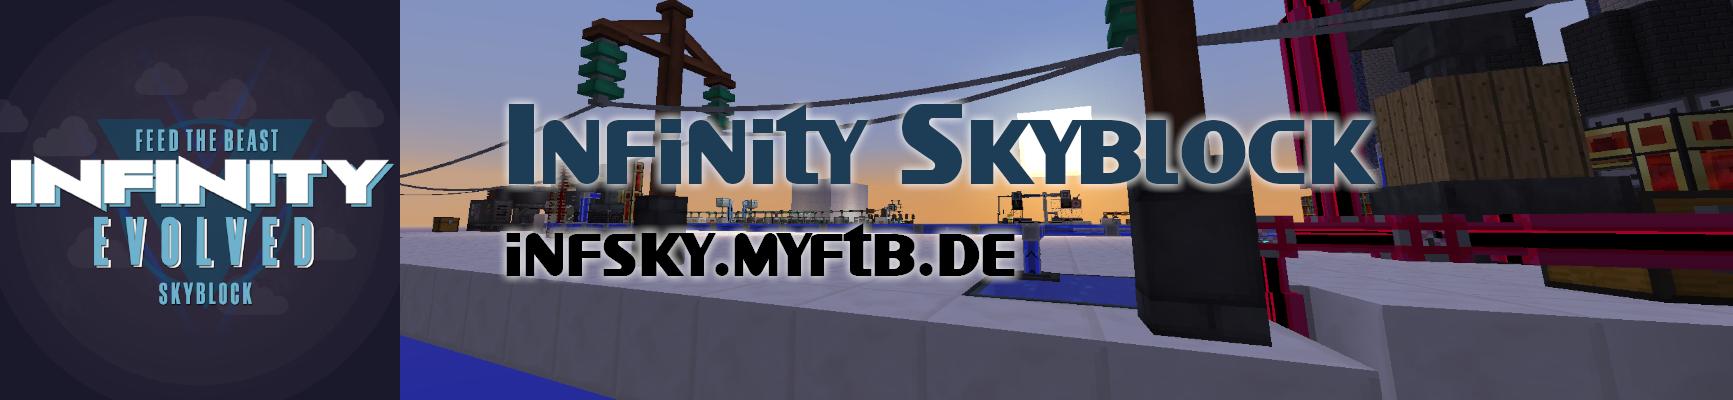 Infinity Skyblock